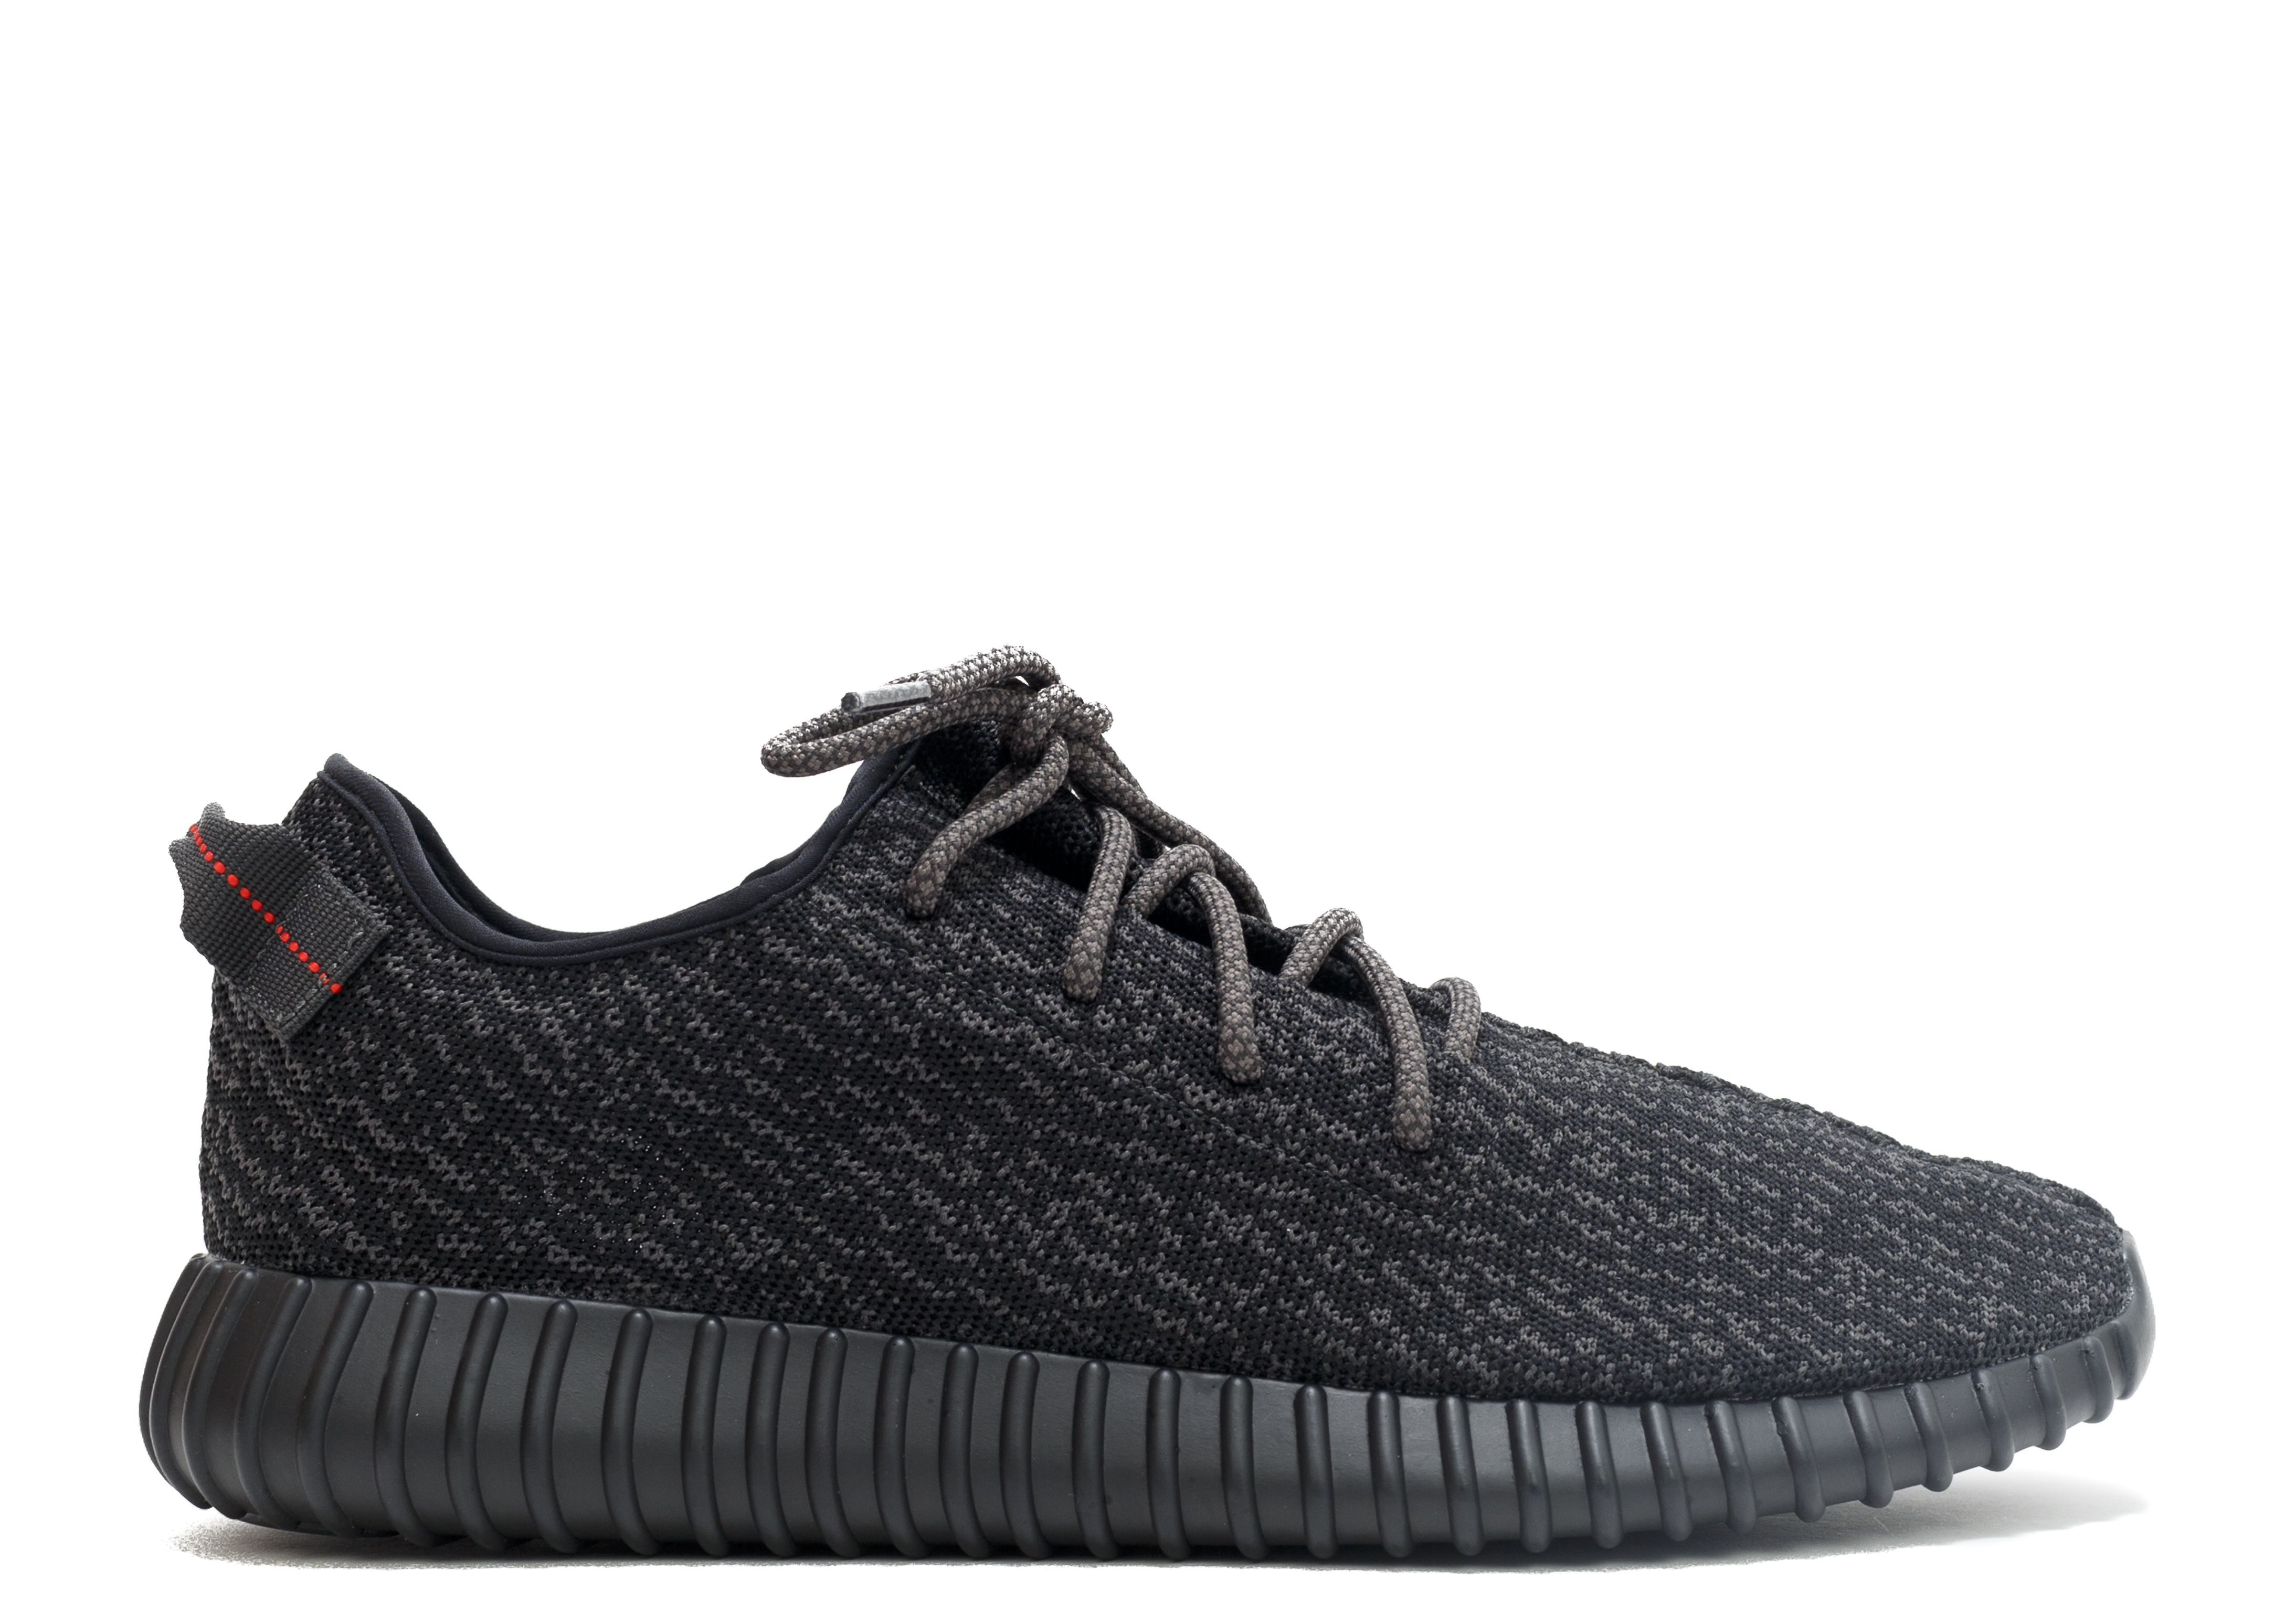 Adidas   Adidas yeezy boost, Yeezy